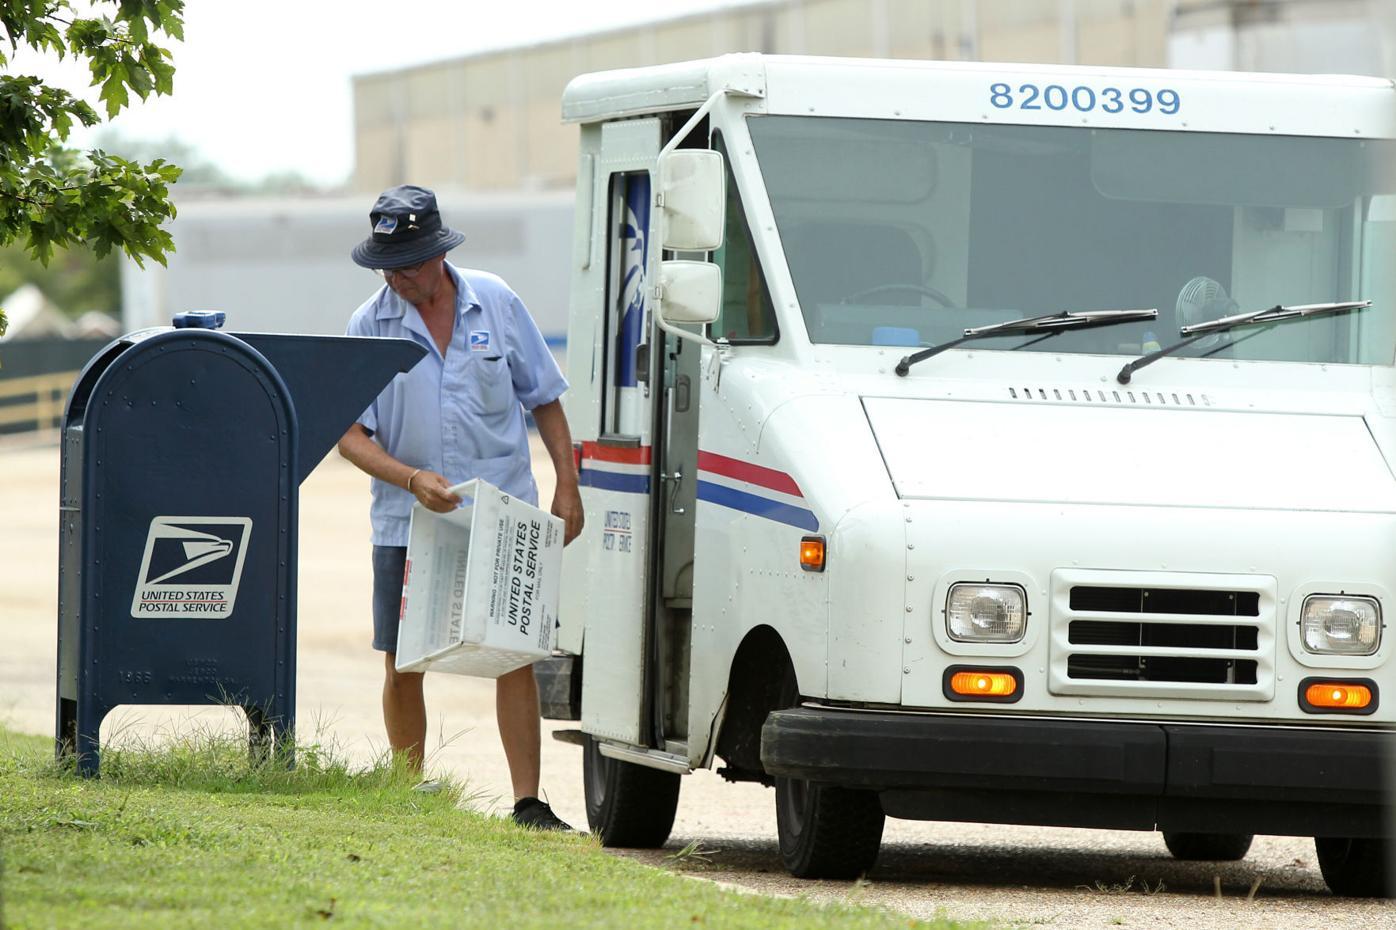 djr-2020-08-30-news-postal-service-arp1